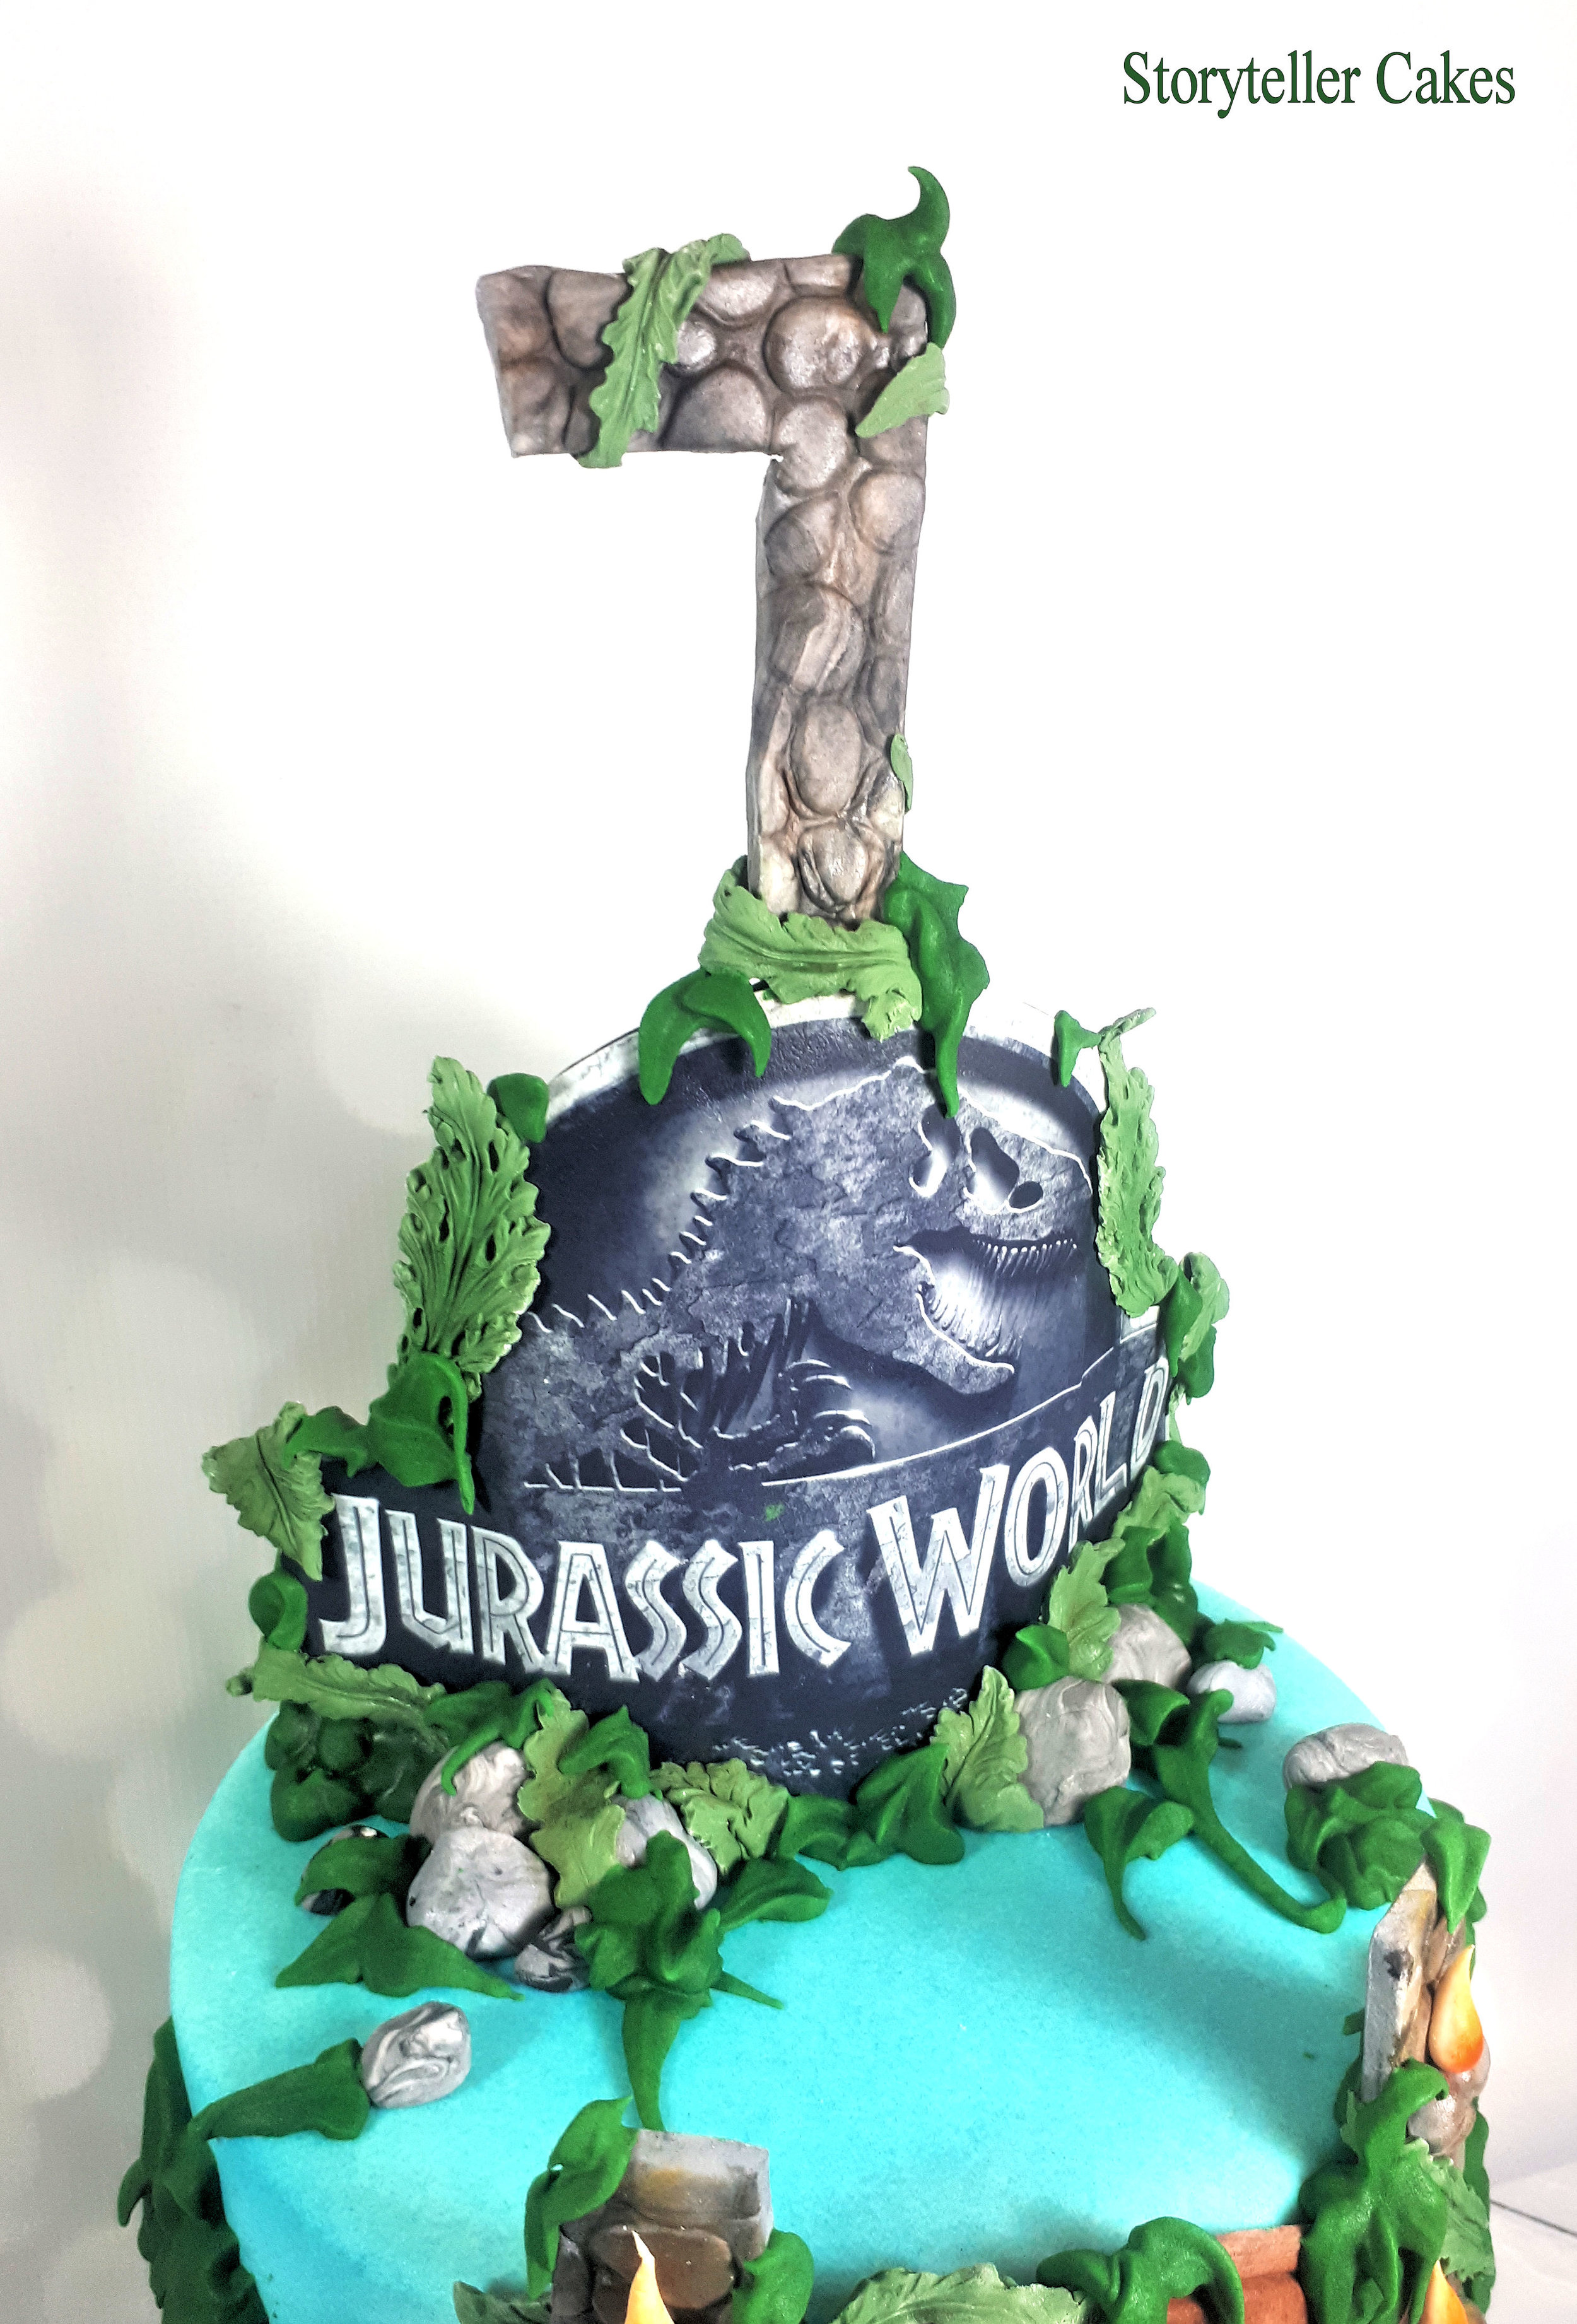 Jurassic World Cake5.jpg